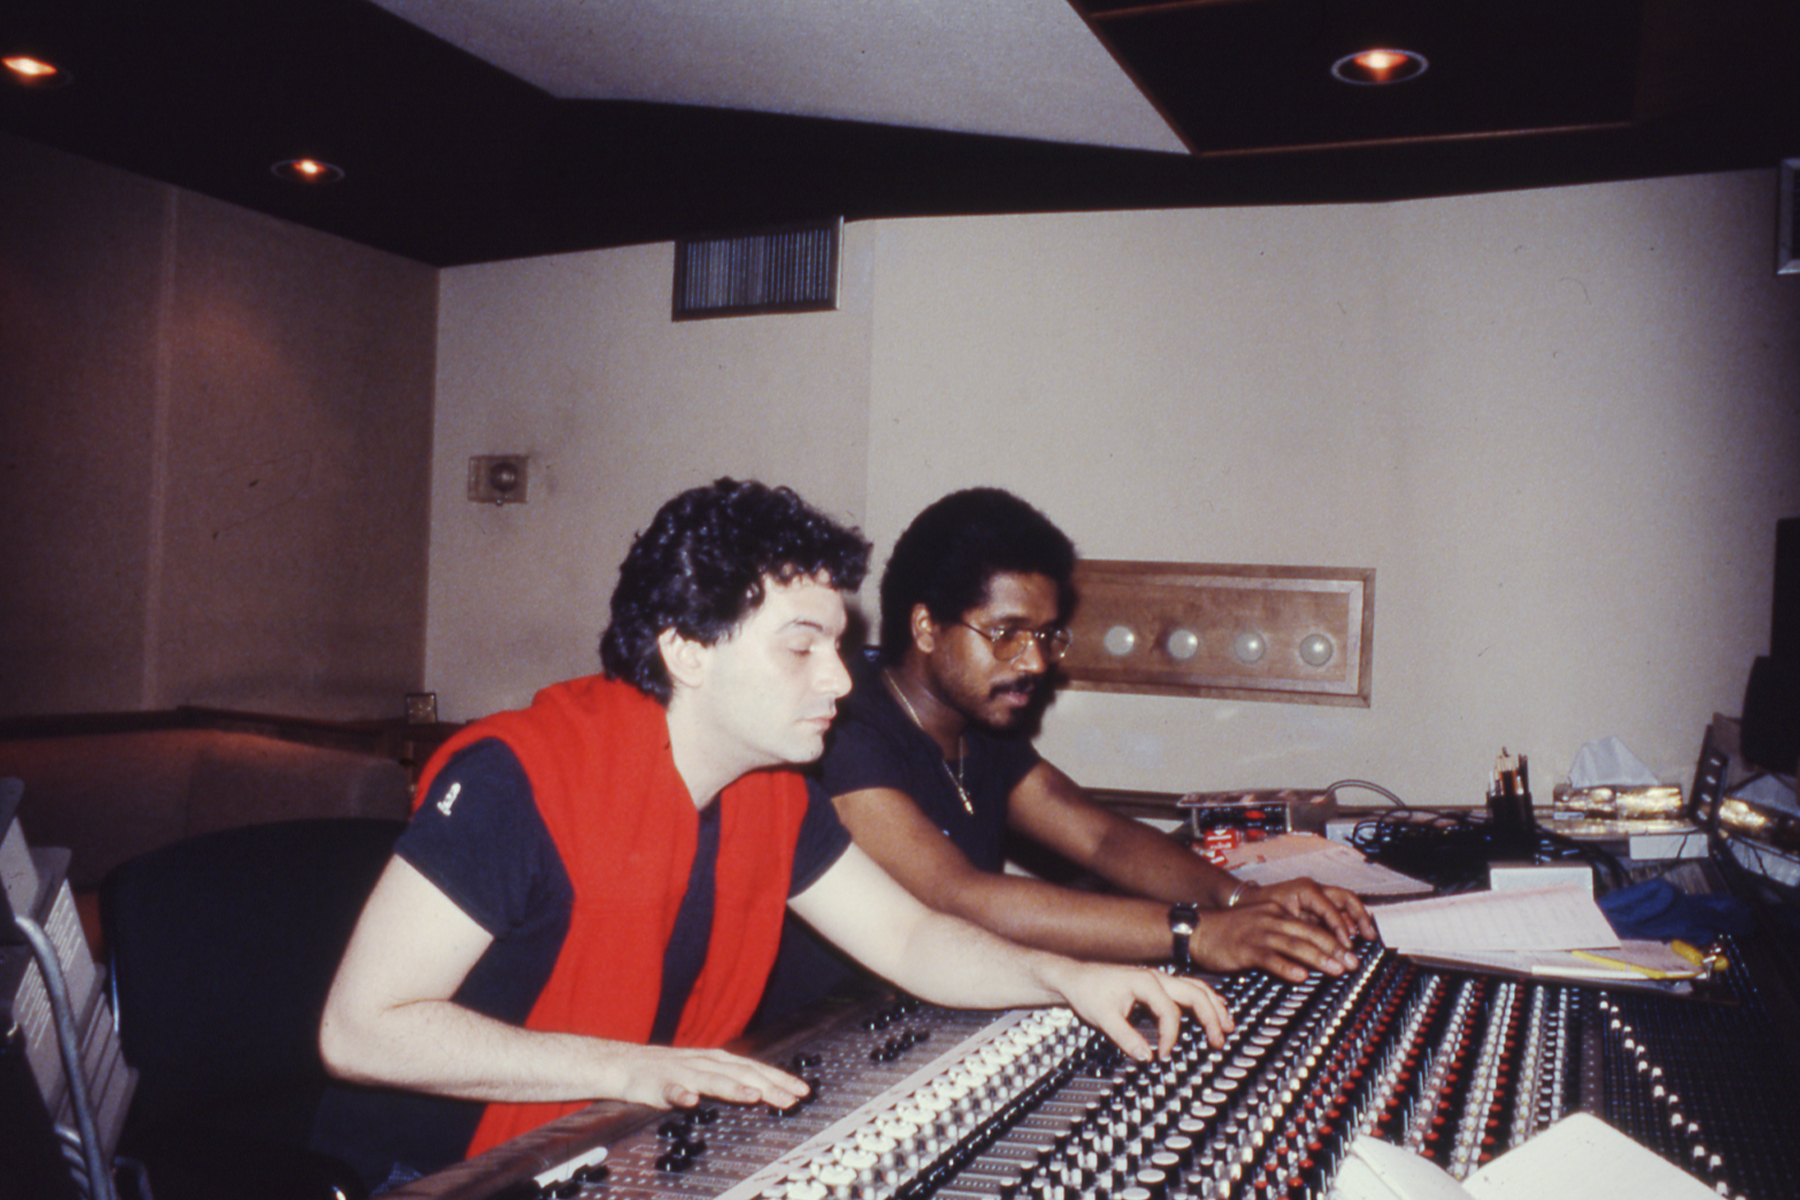 Mark Kamins and Butch Jones in studio. Courtesy of Butch Jones.